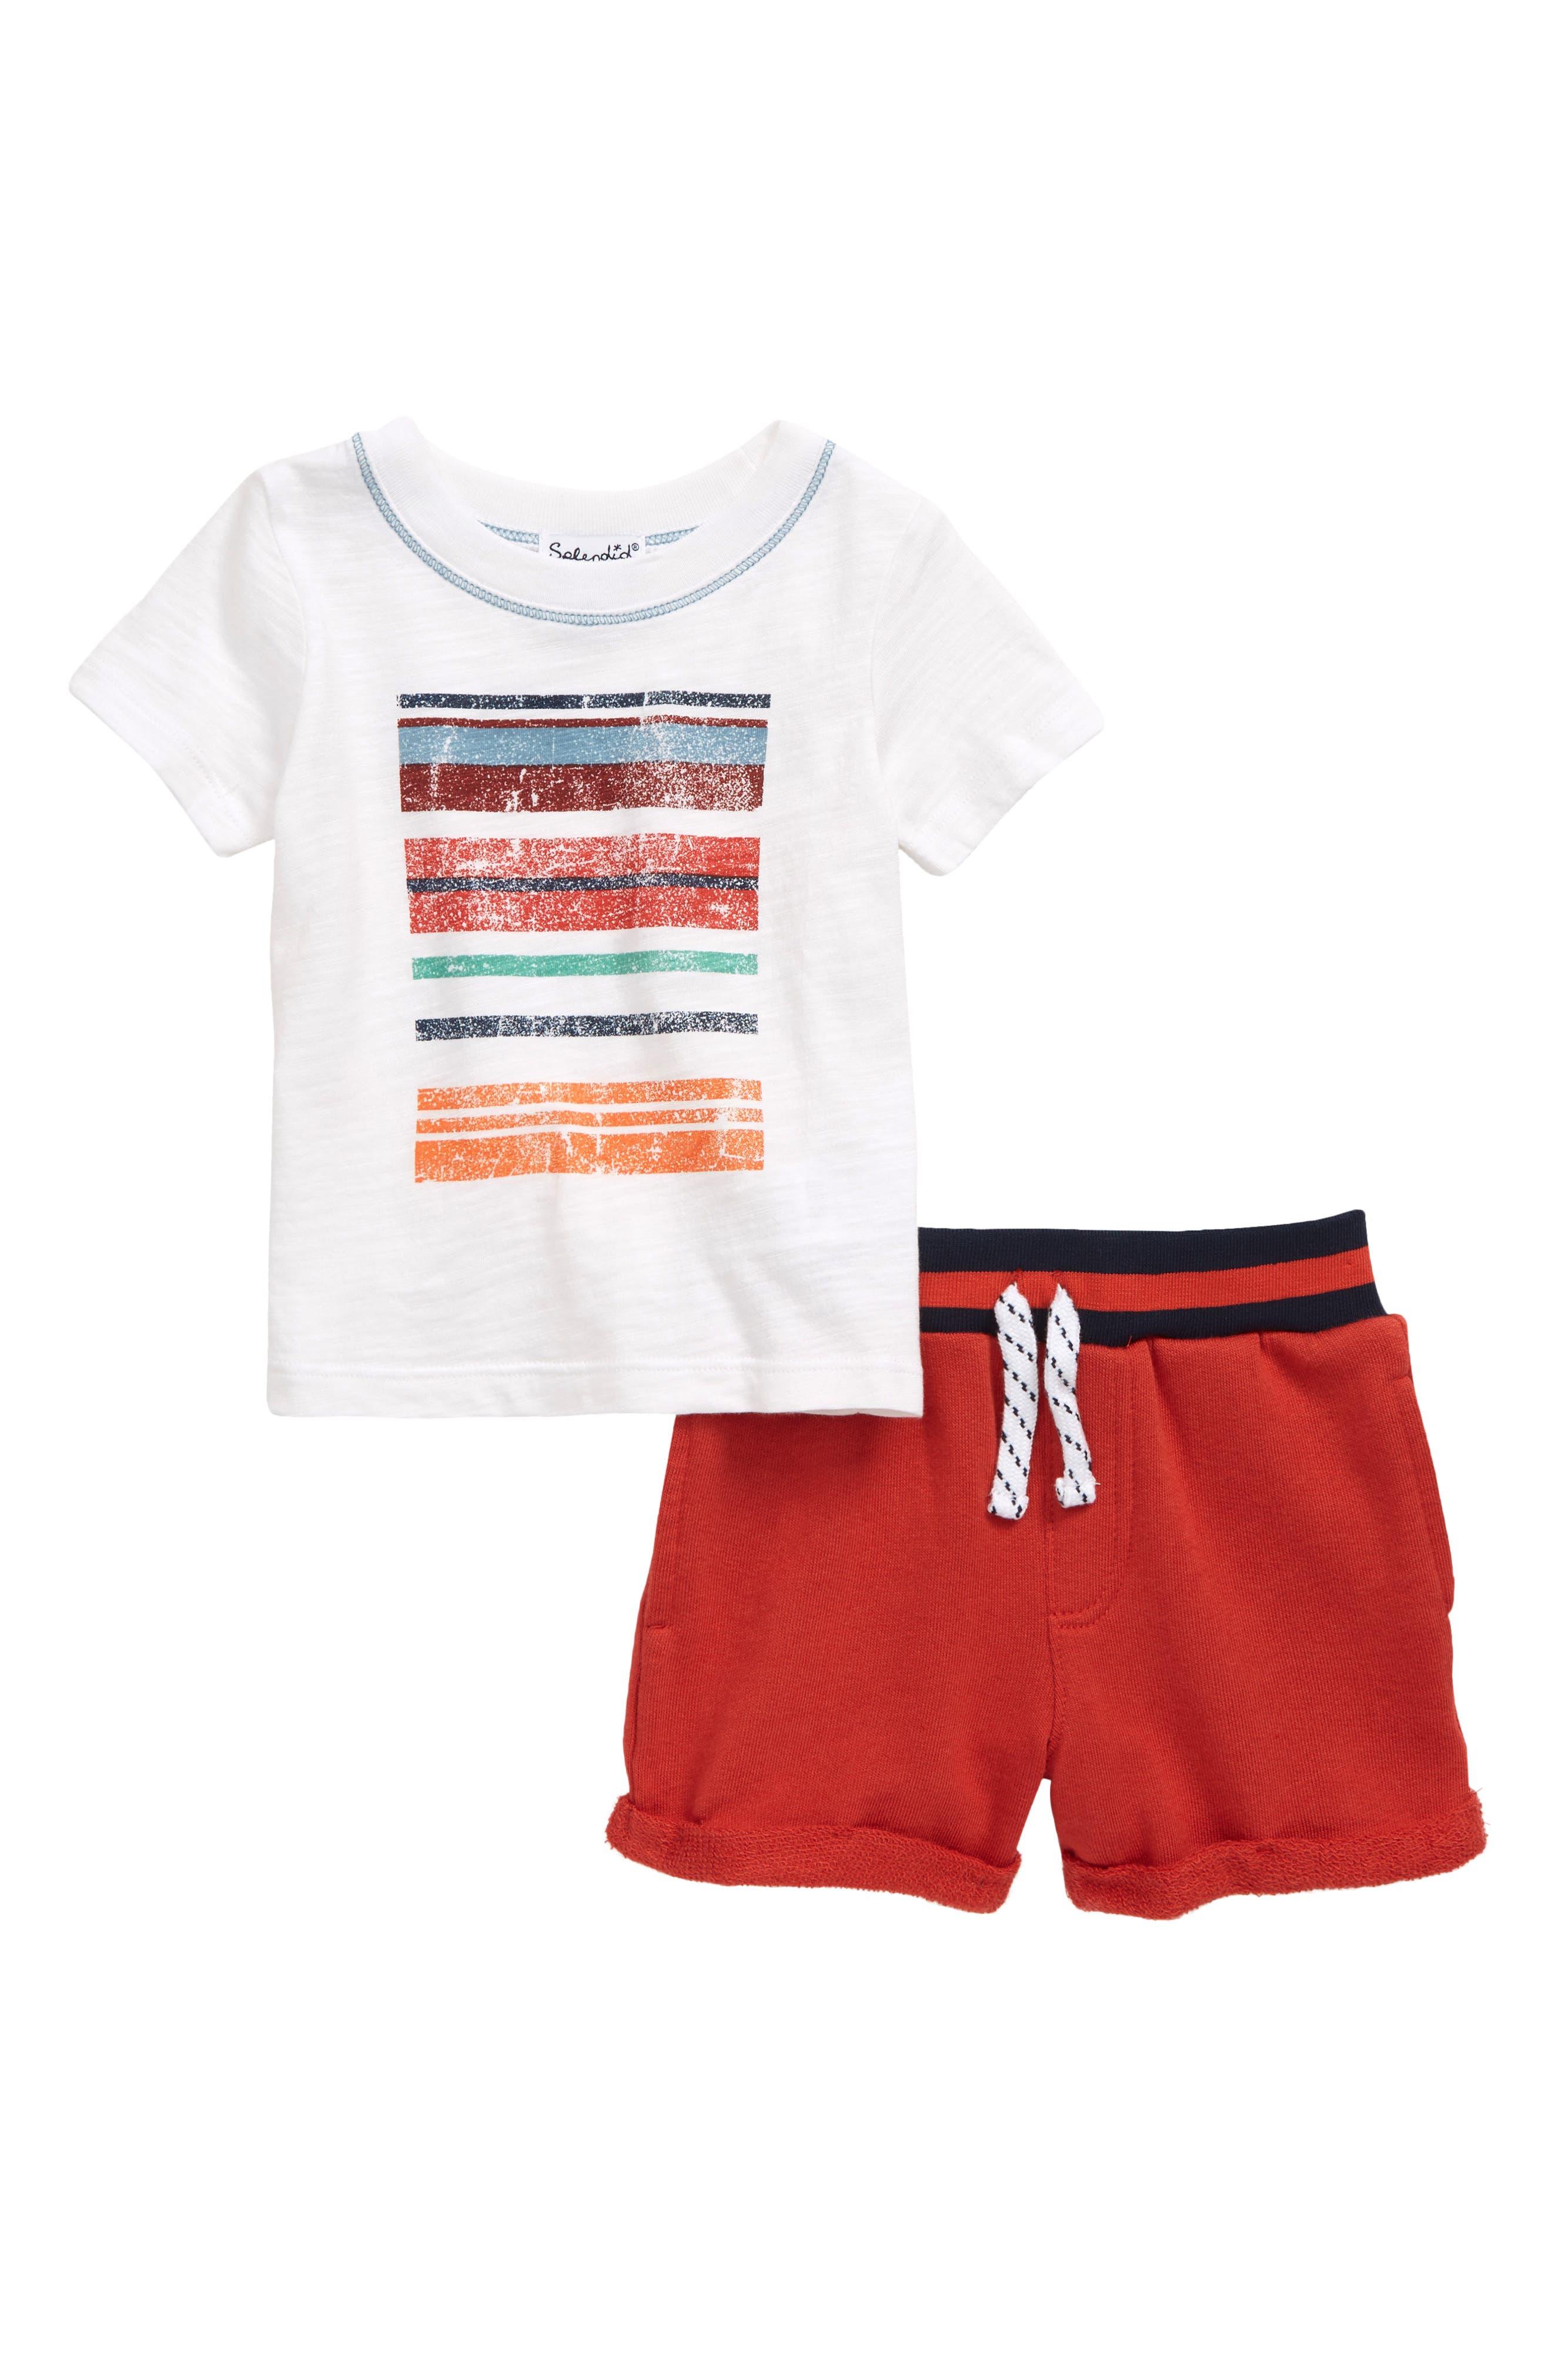 Image of Splendid Stripe Graphic Tee & Shorts Set